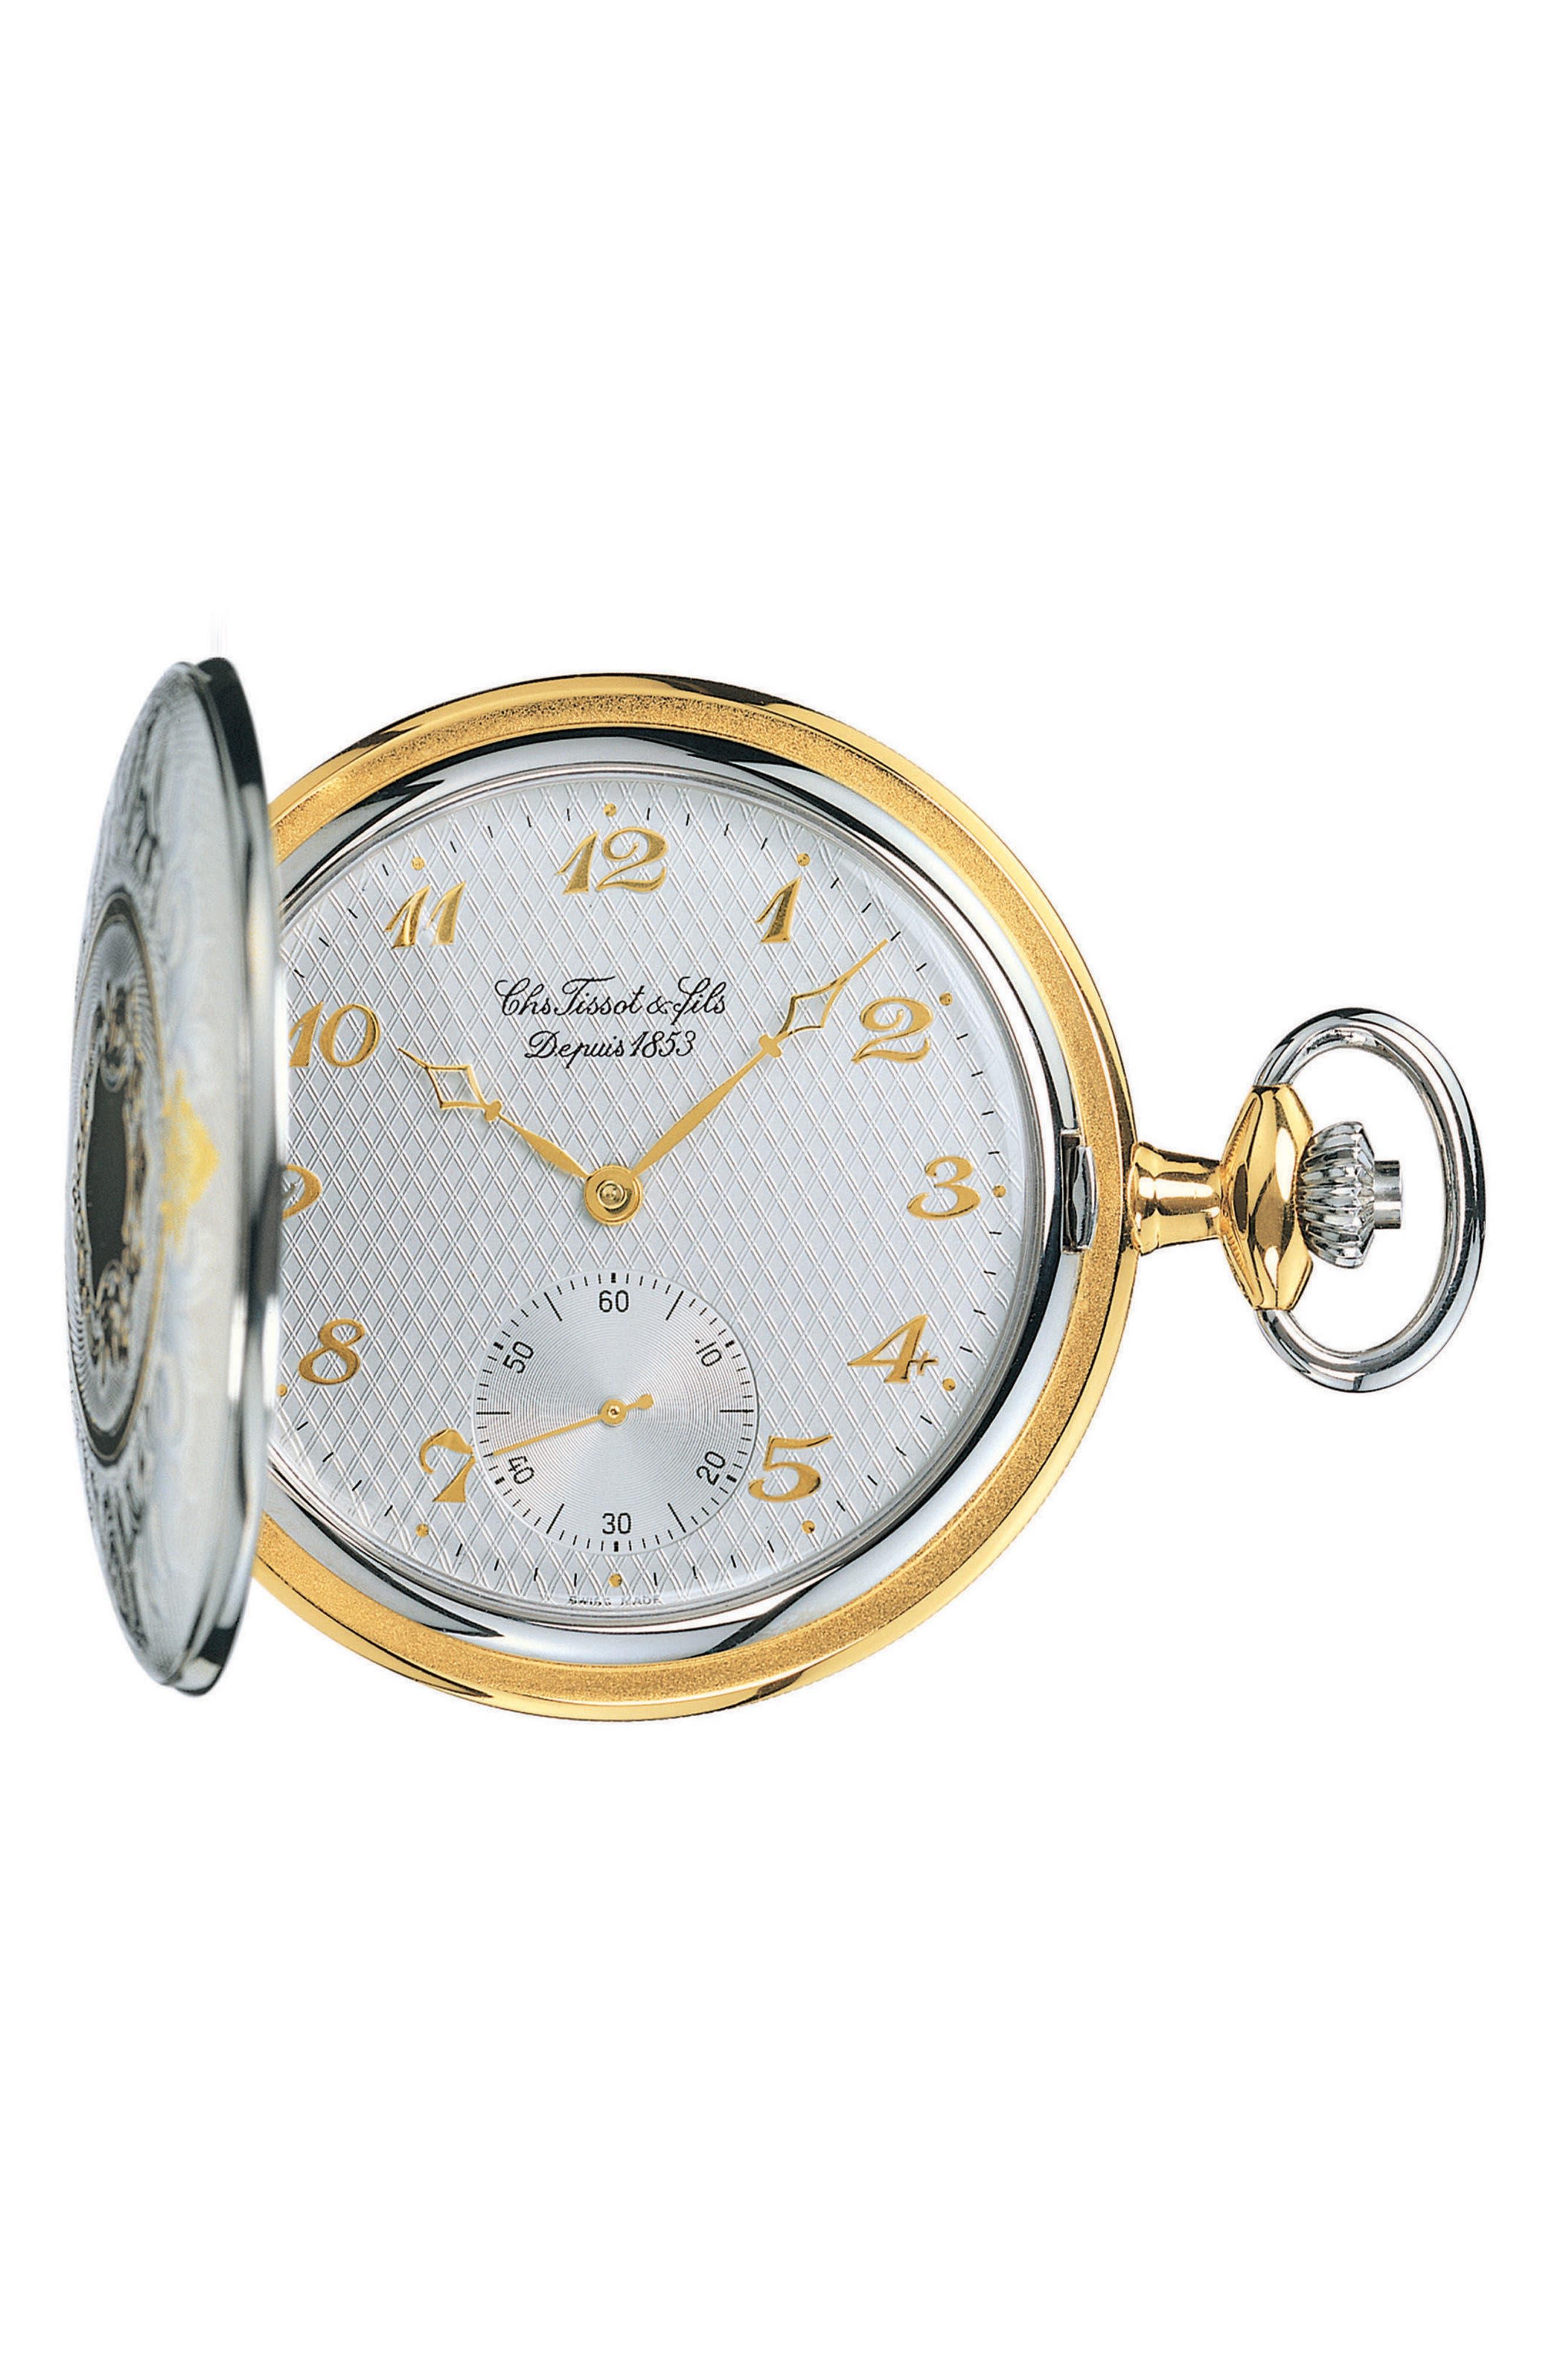 Main Image - Tissot Savonnette Pocket Watch, 49mm